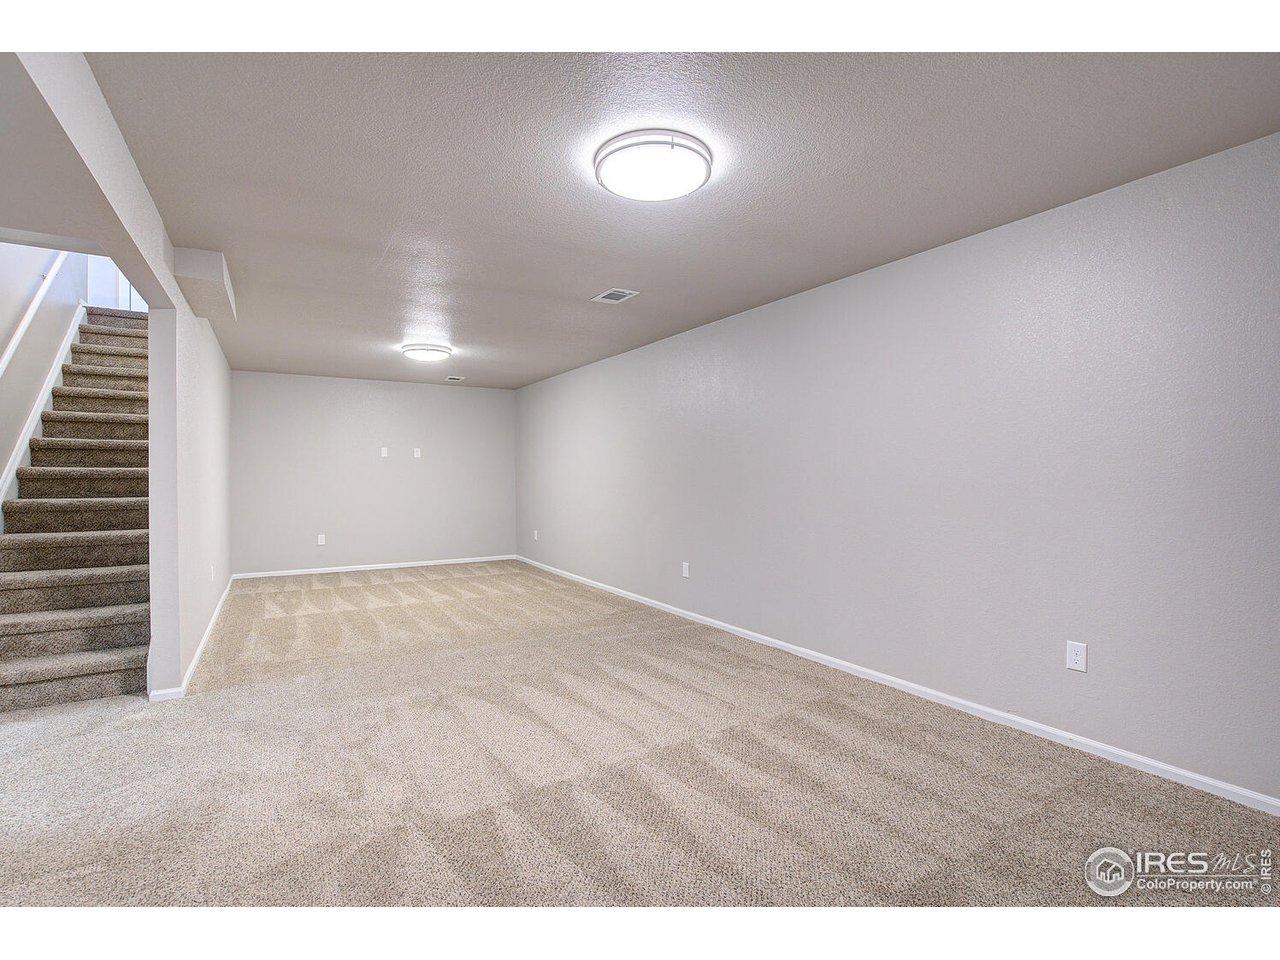 WOW, 27 x 11 Family room